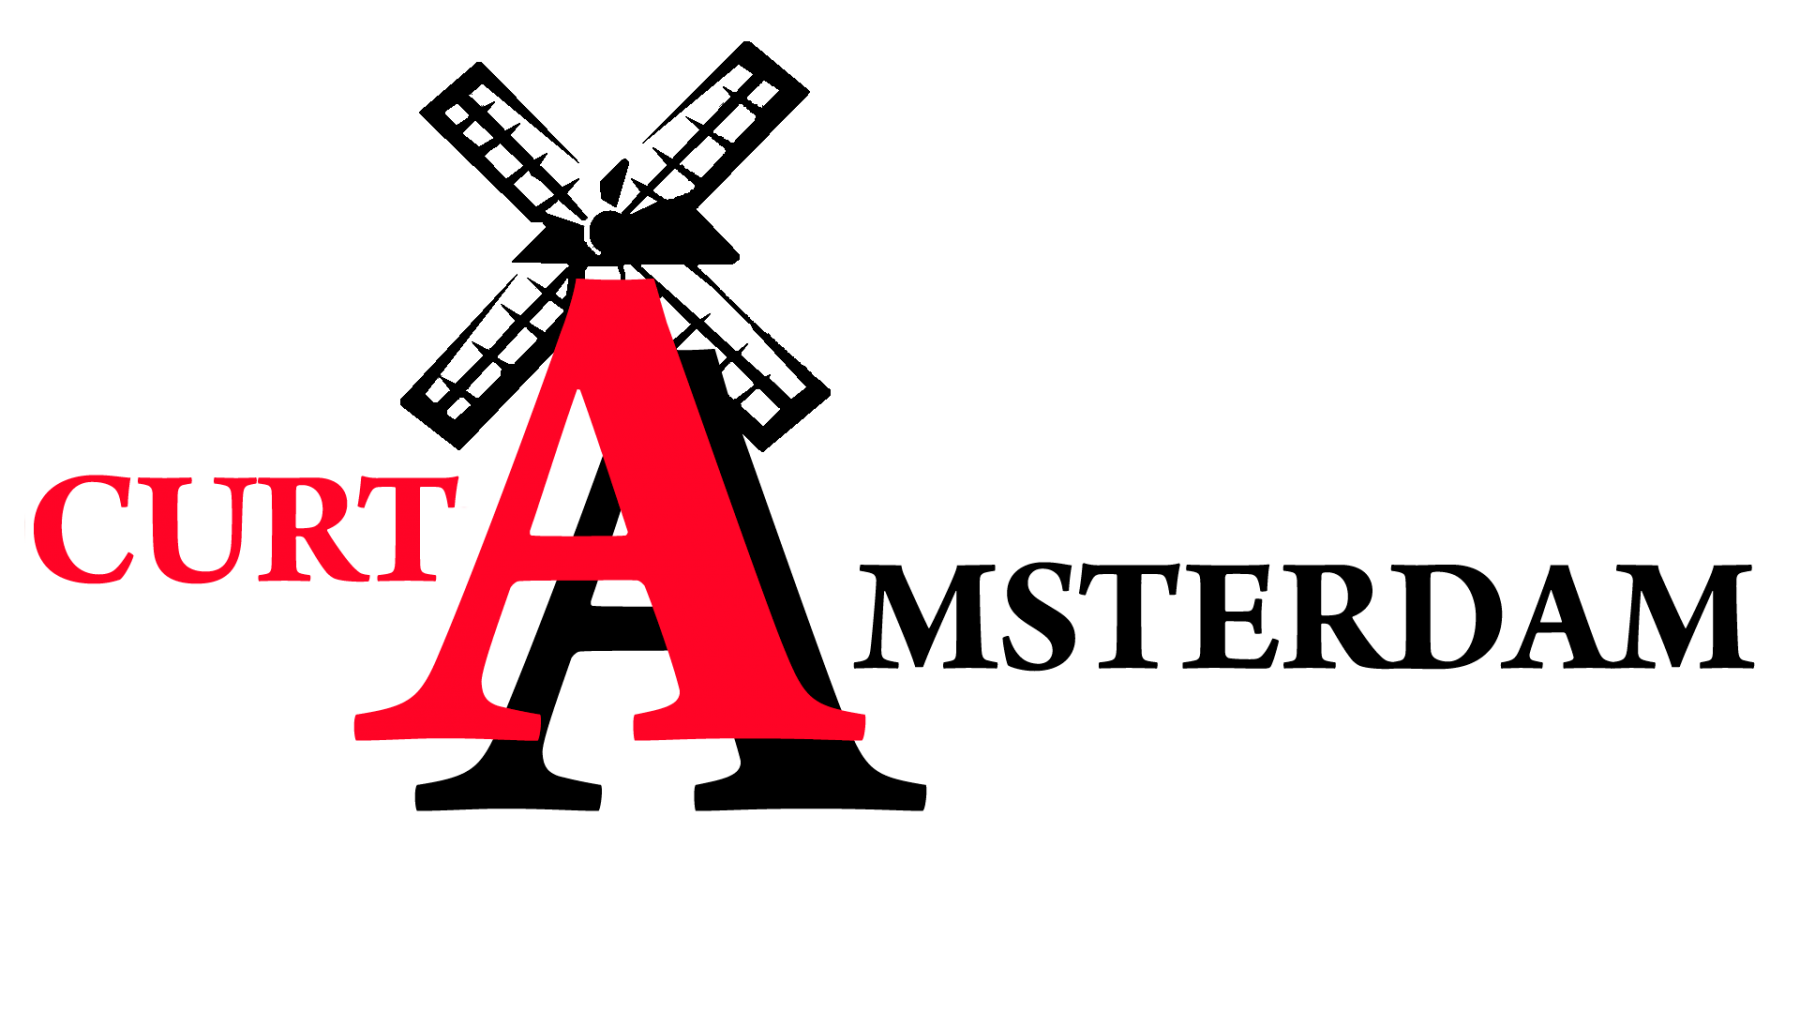 Logotipo Curtamsterdam